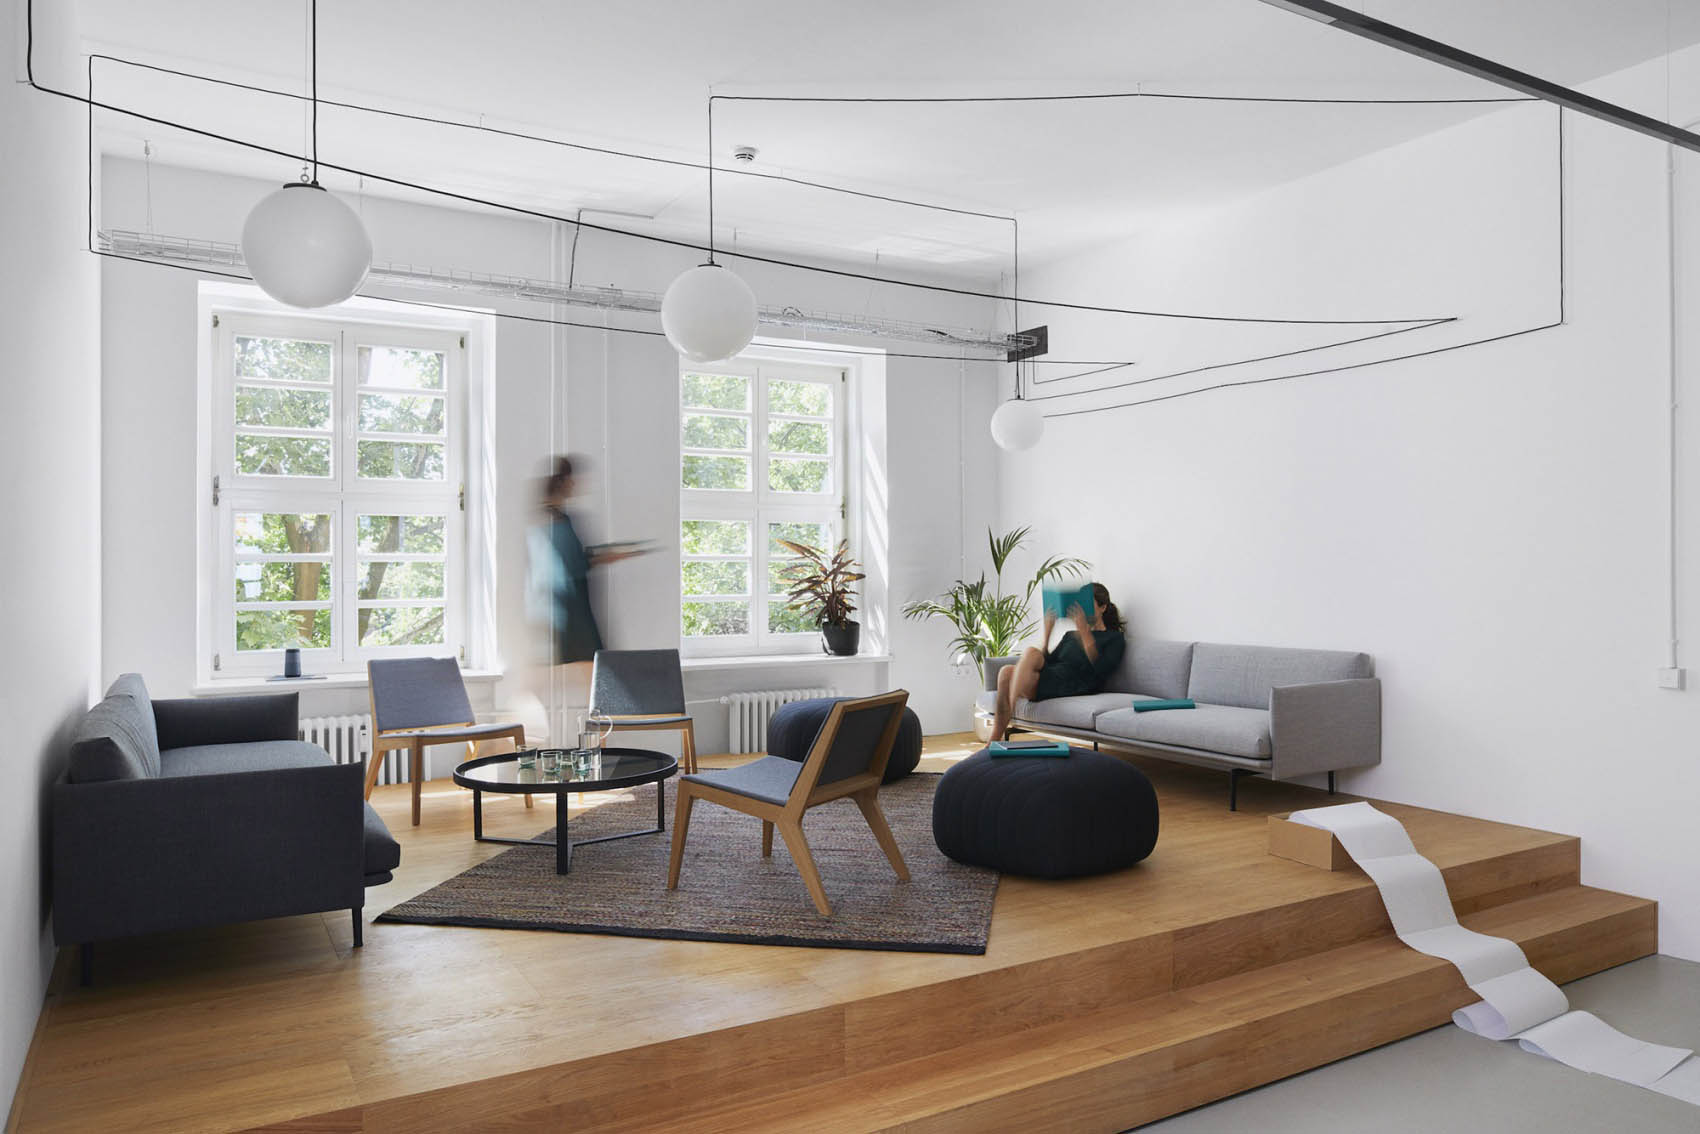 FULL-NODE-LXSY-Architekten-DeVorm-Projects-09-XL_1-XL